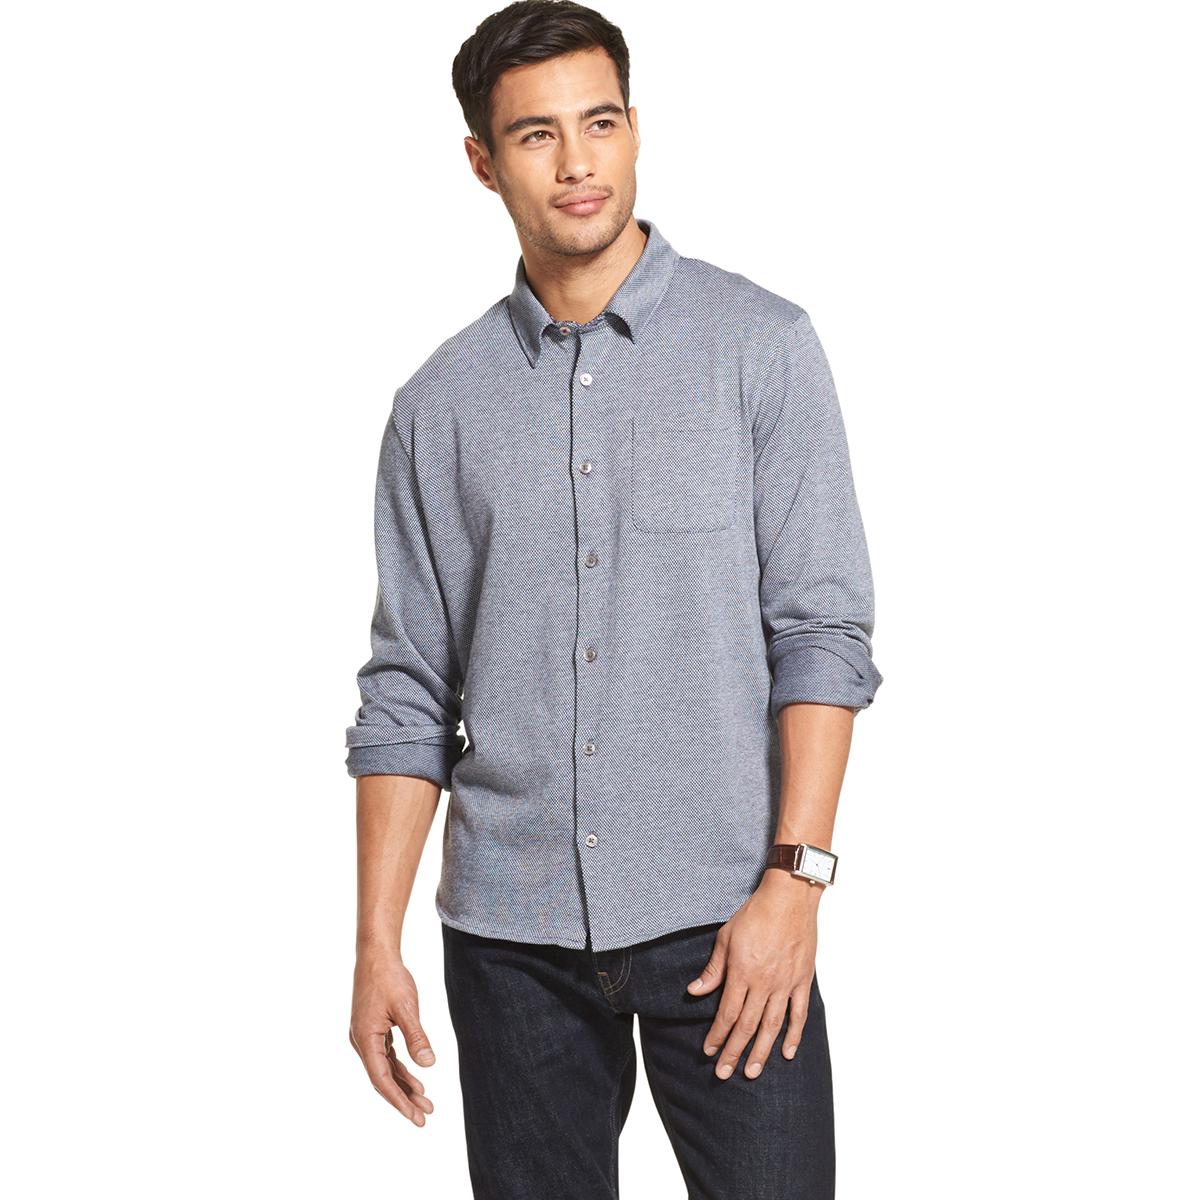 Van Heusen Men's Never Tuck Long Sleeve Jacquard Button-Front Shirt - White, M